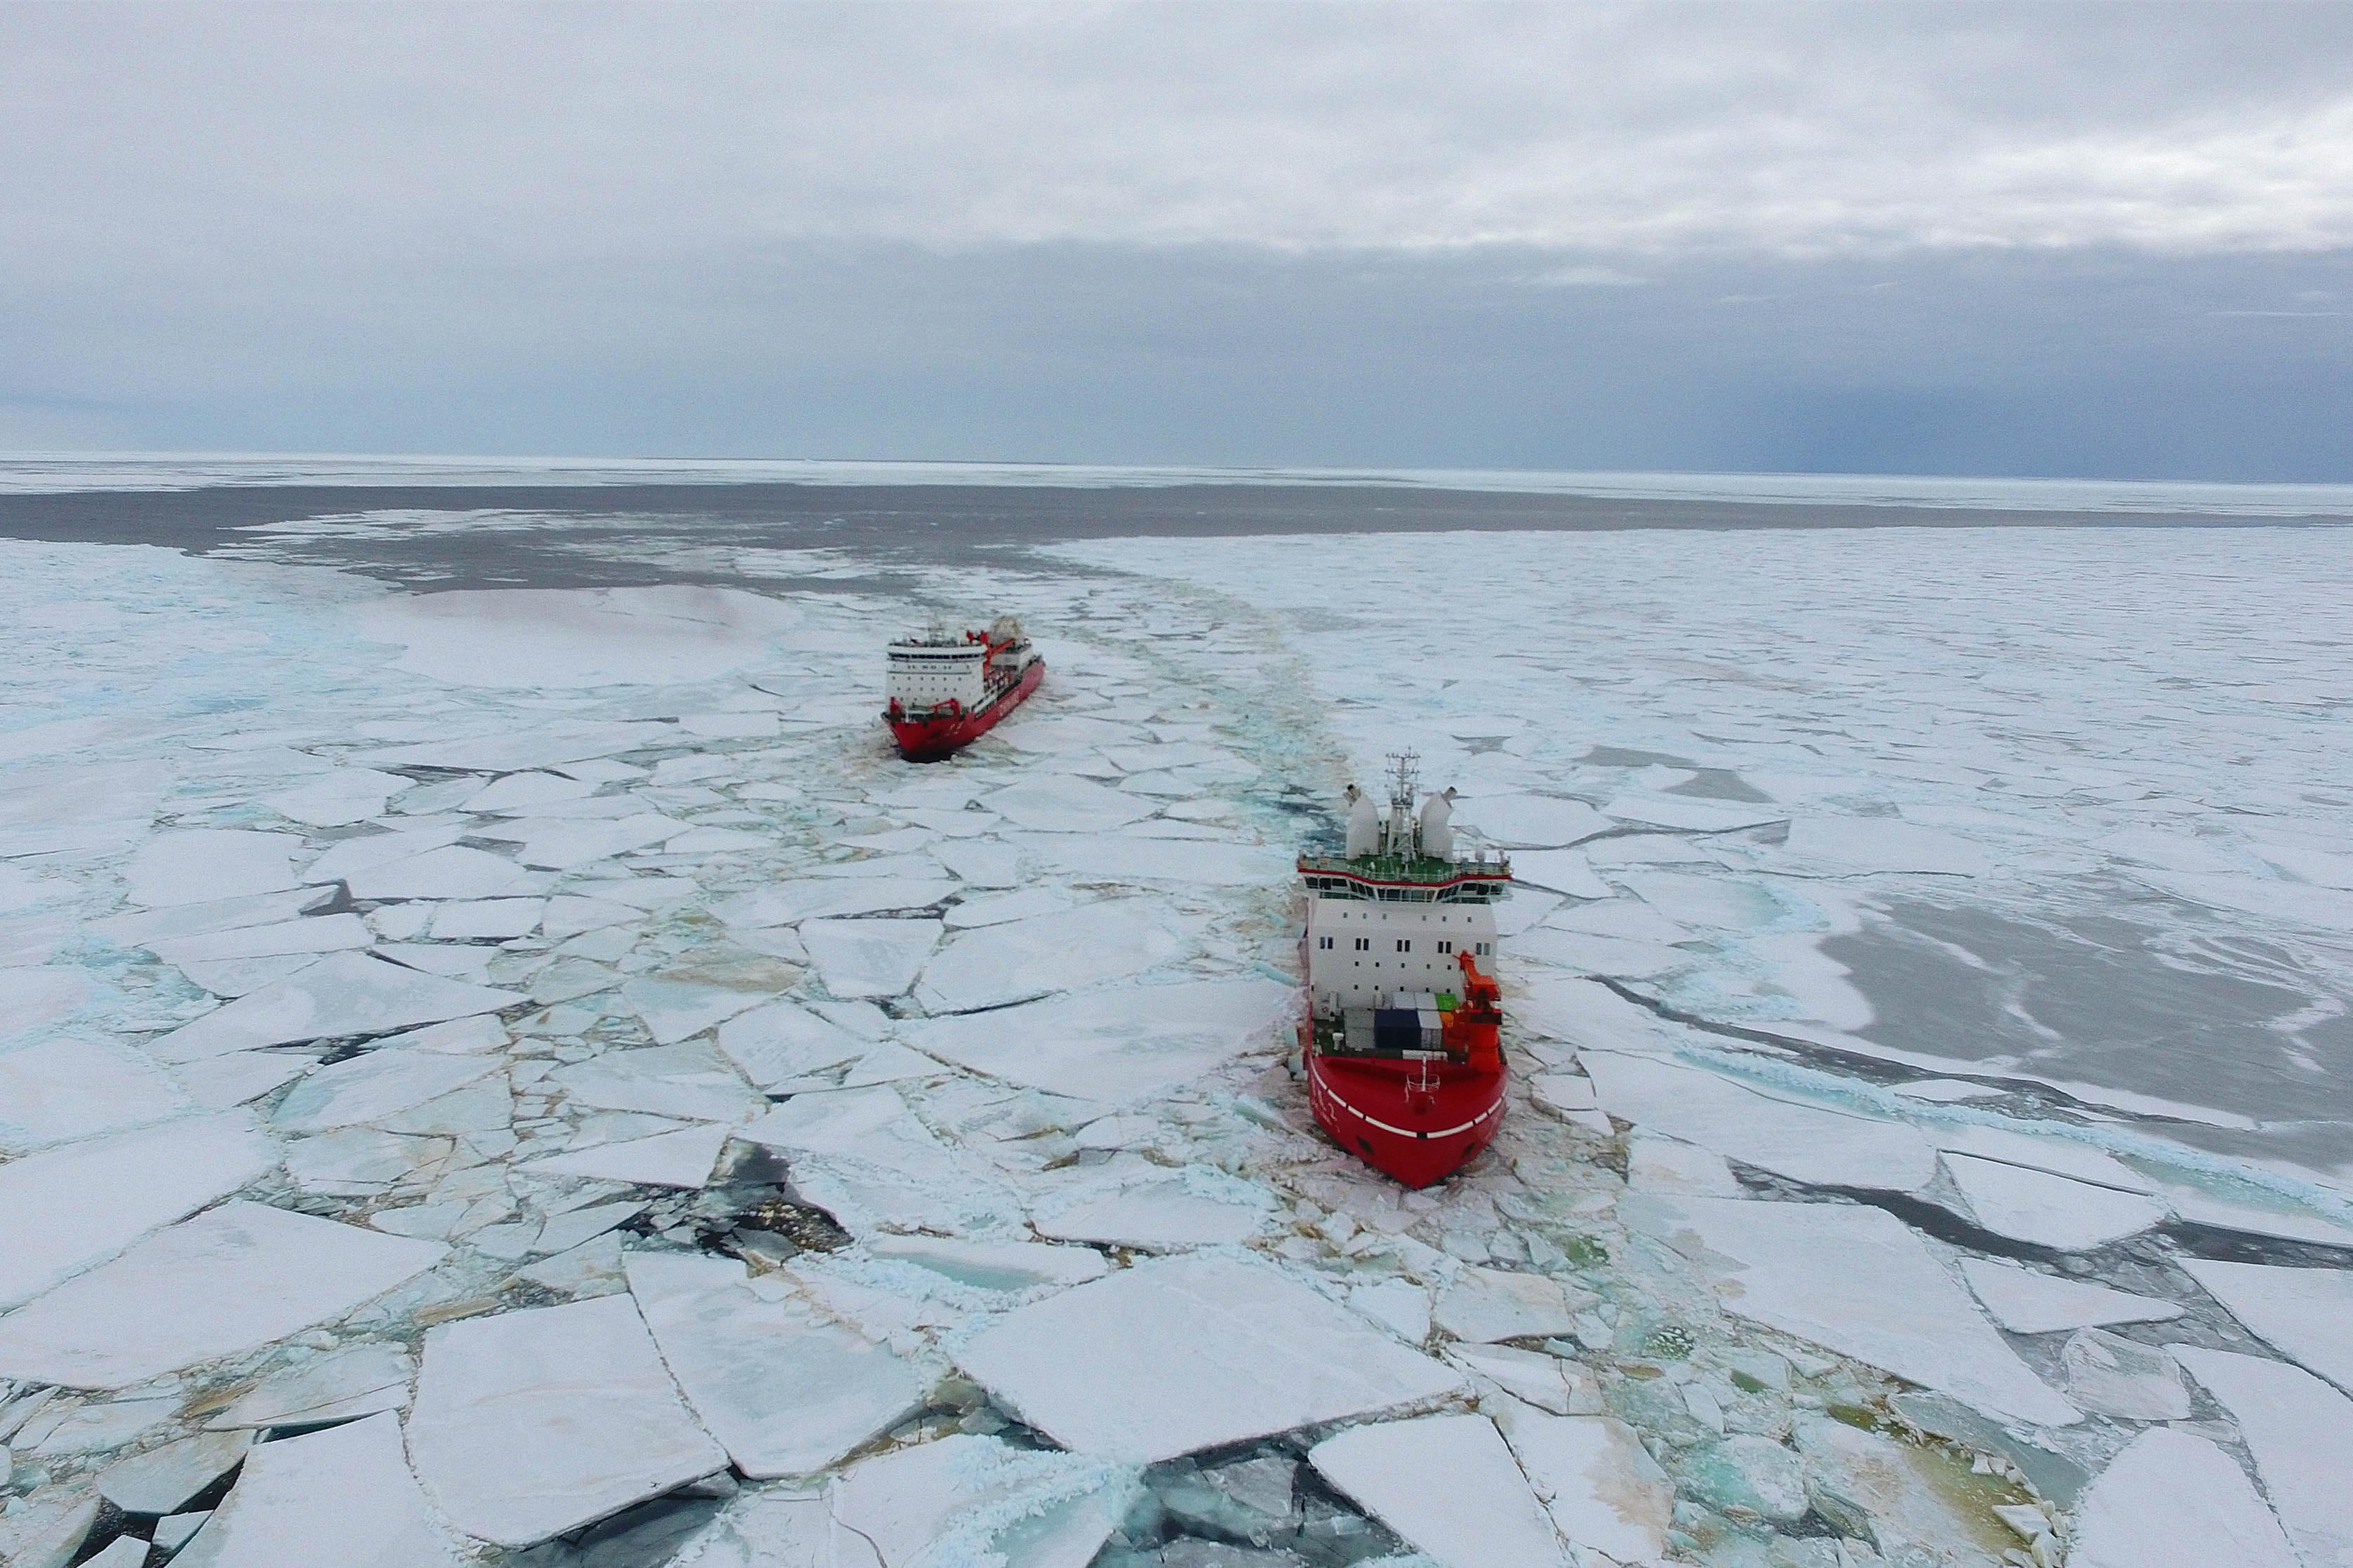 China's polar icebreakers reach the waters near the Zhongshan Station in Antarctica - Xinhua | English.news.cn